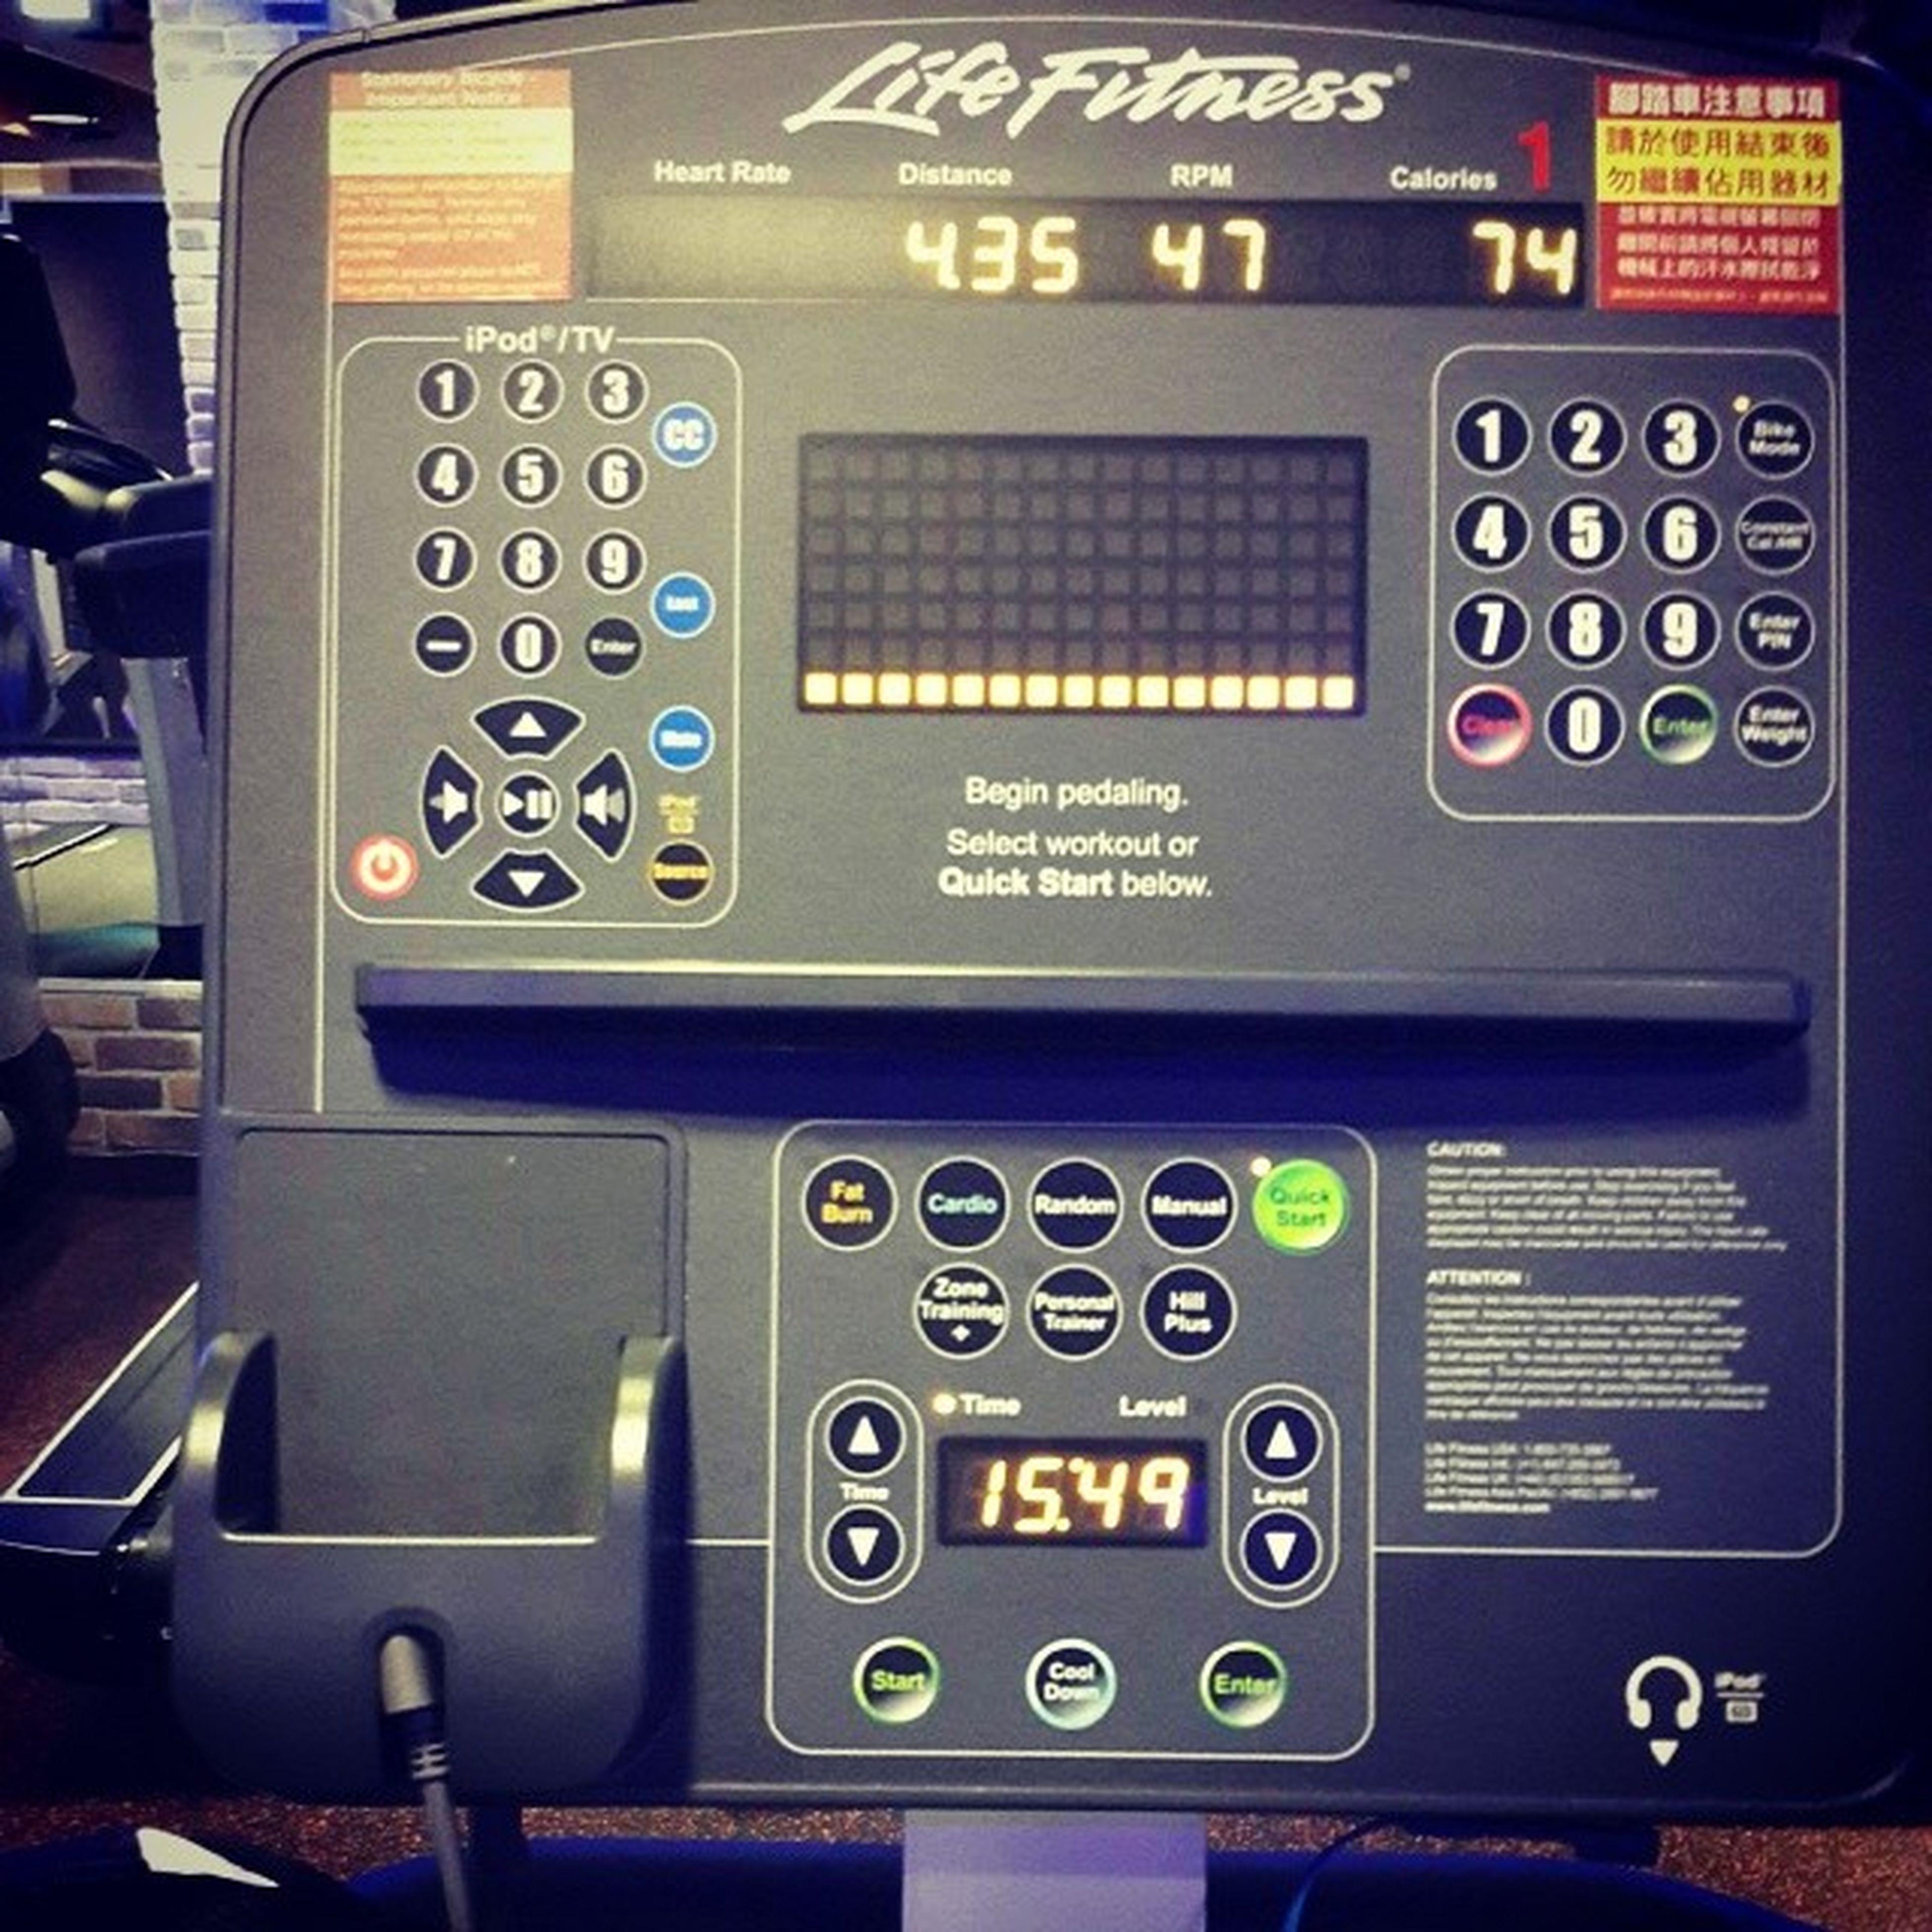 Keep fat目標體脂18 in 健身工坊健身工坊